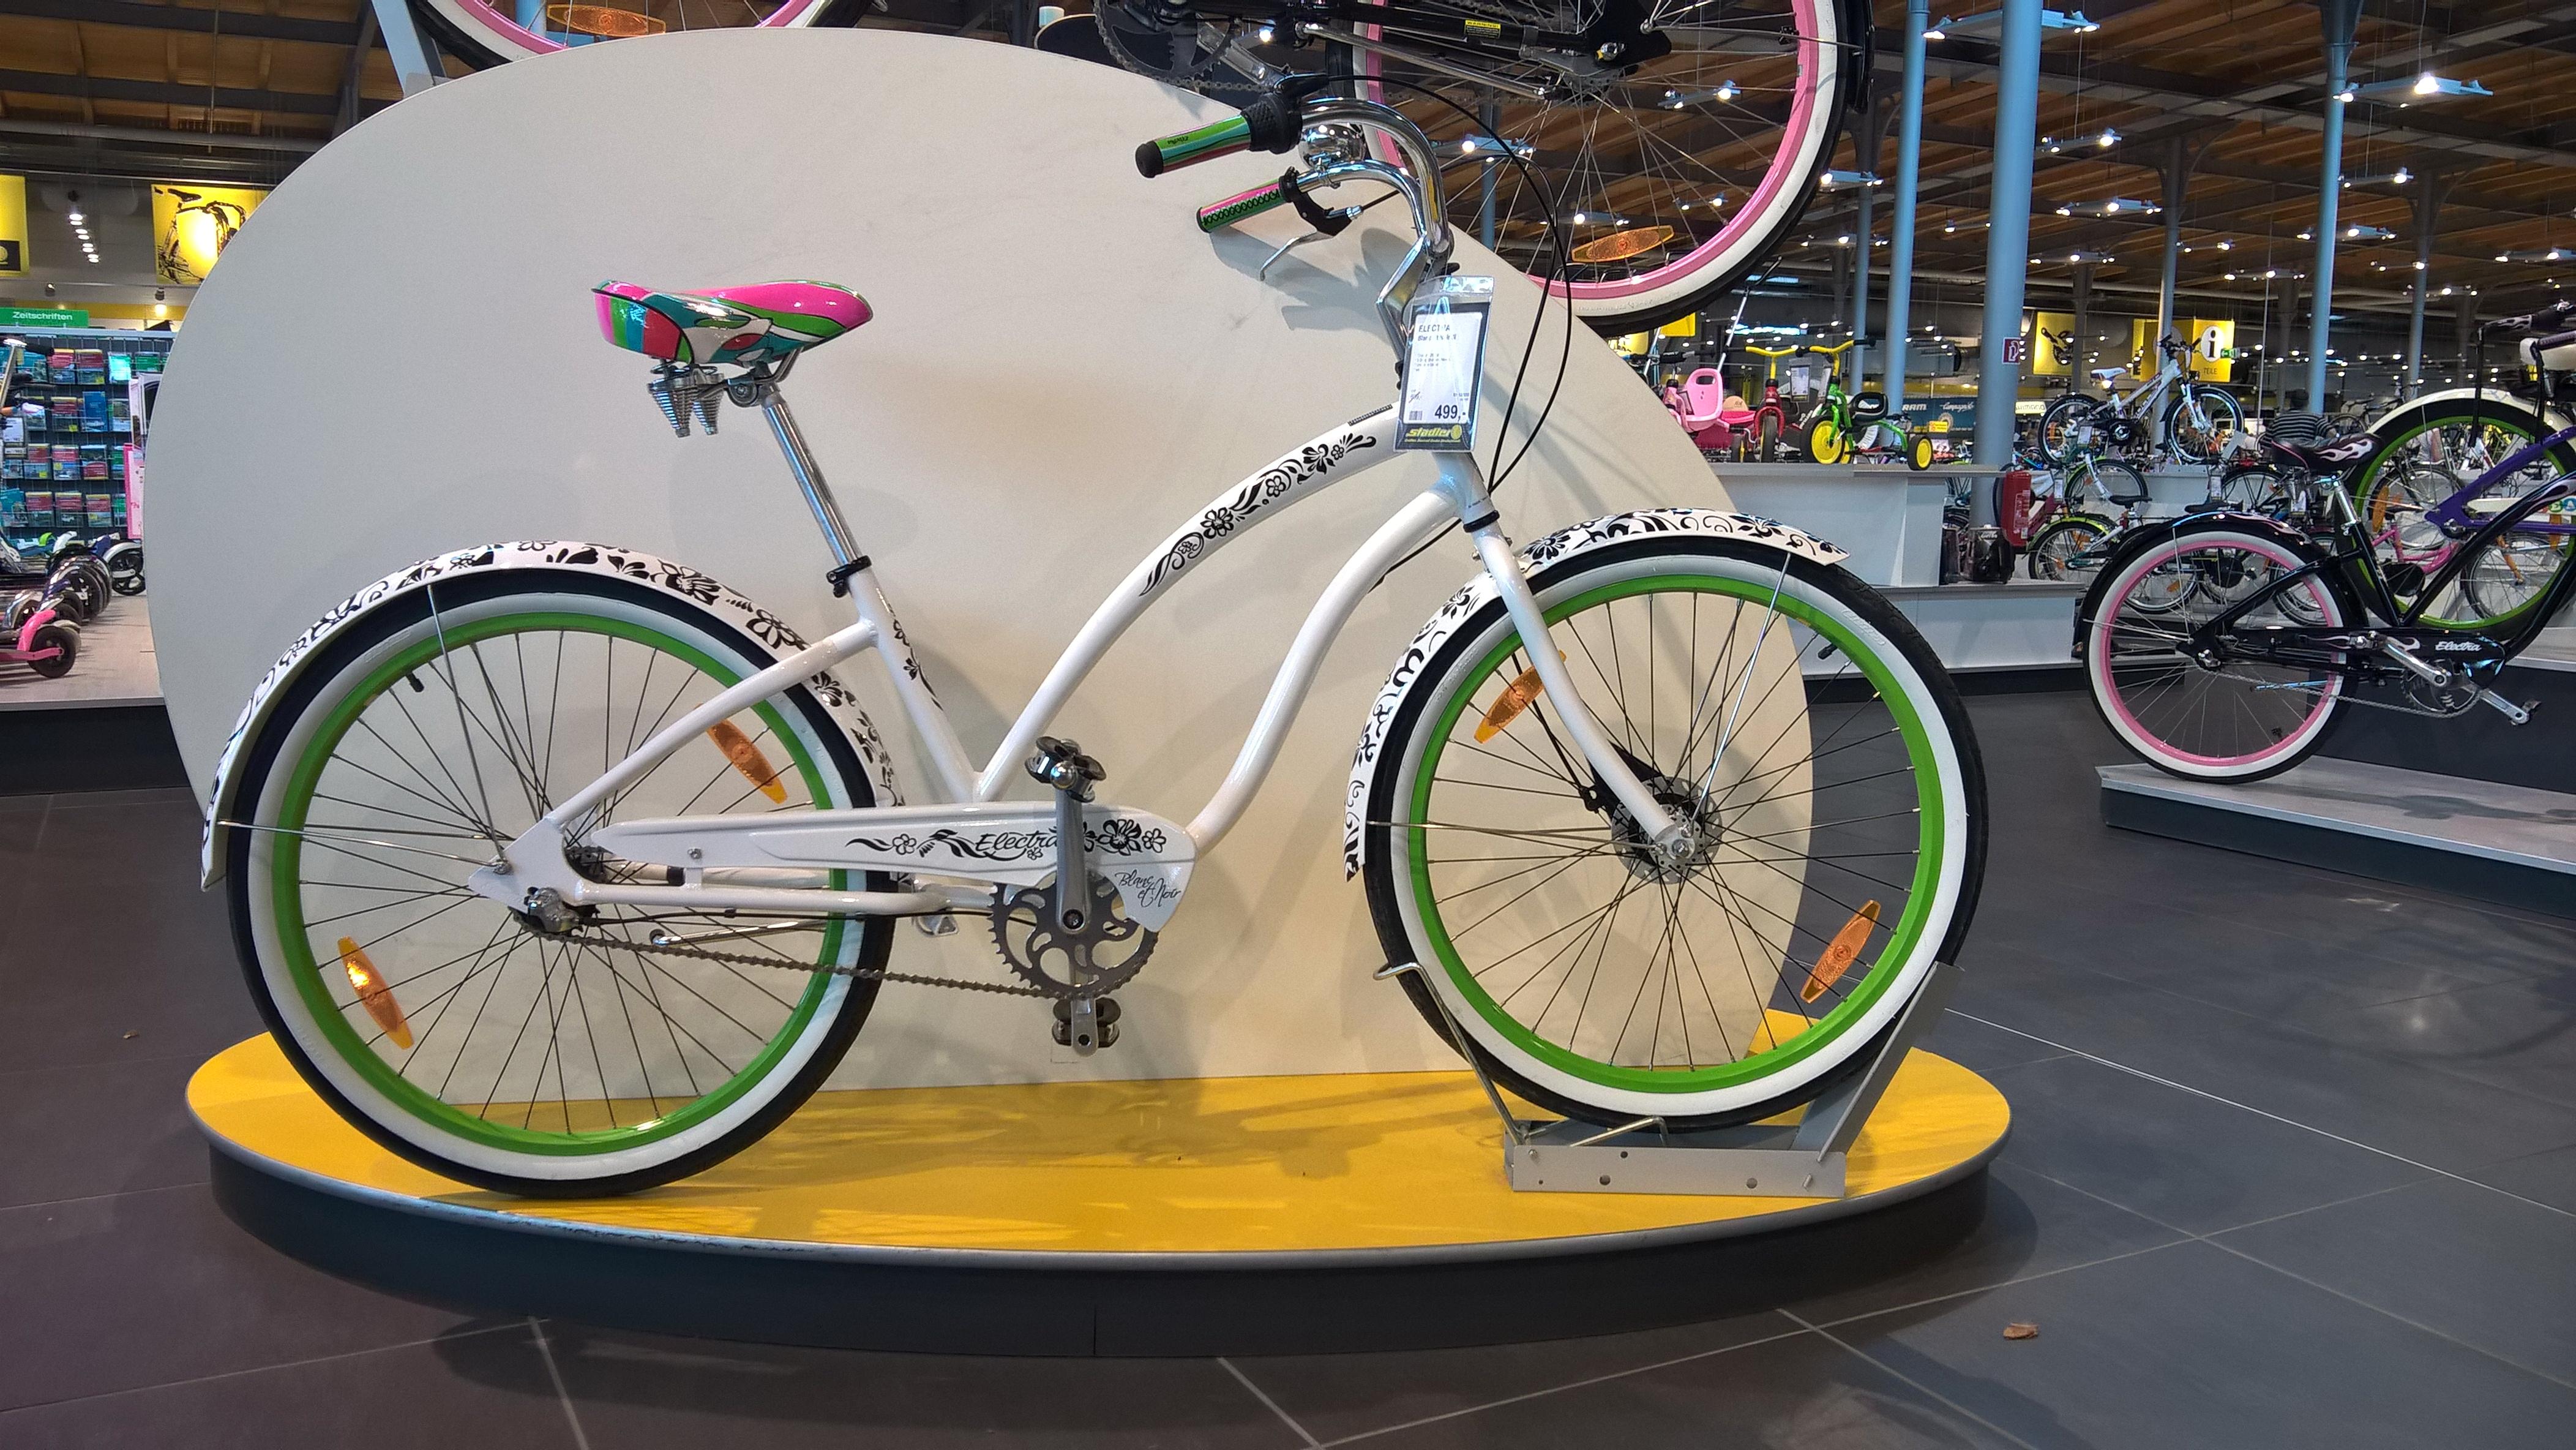 16-07-20-Electra-Bike-WP 20160711 14 45 14 Pro.jpg